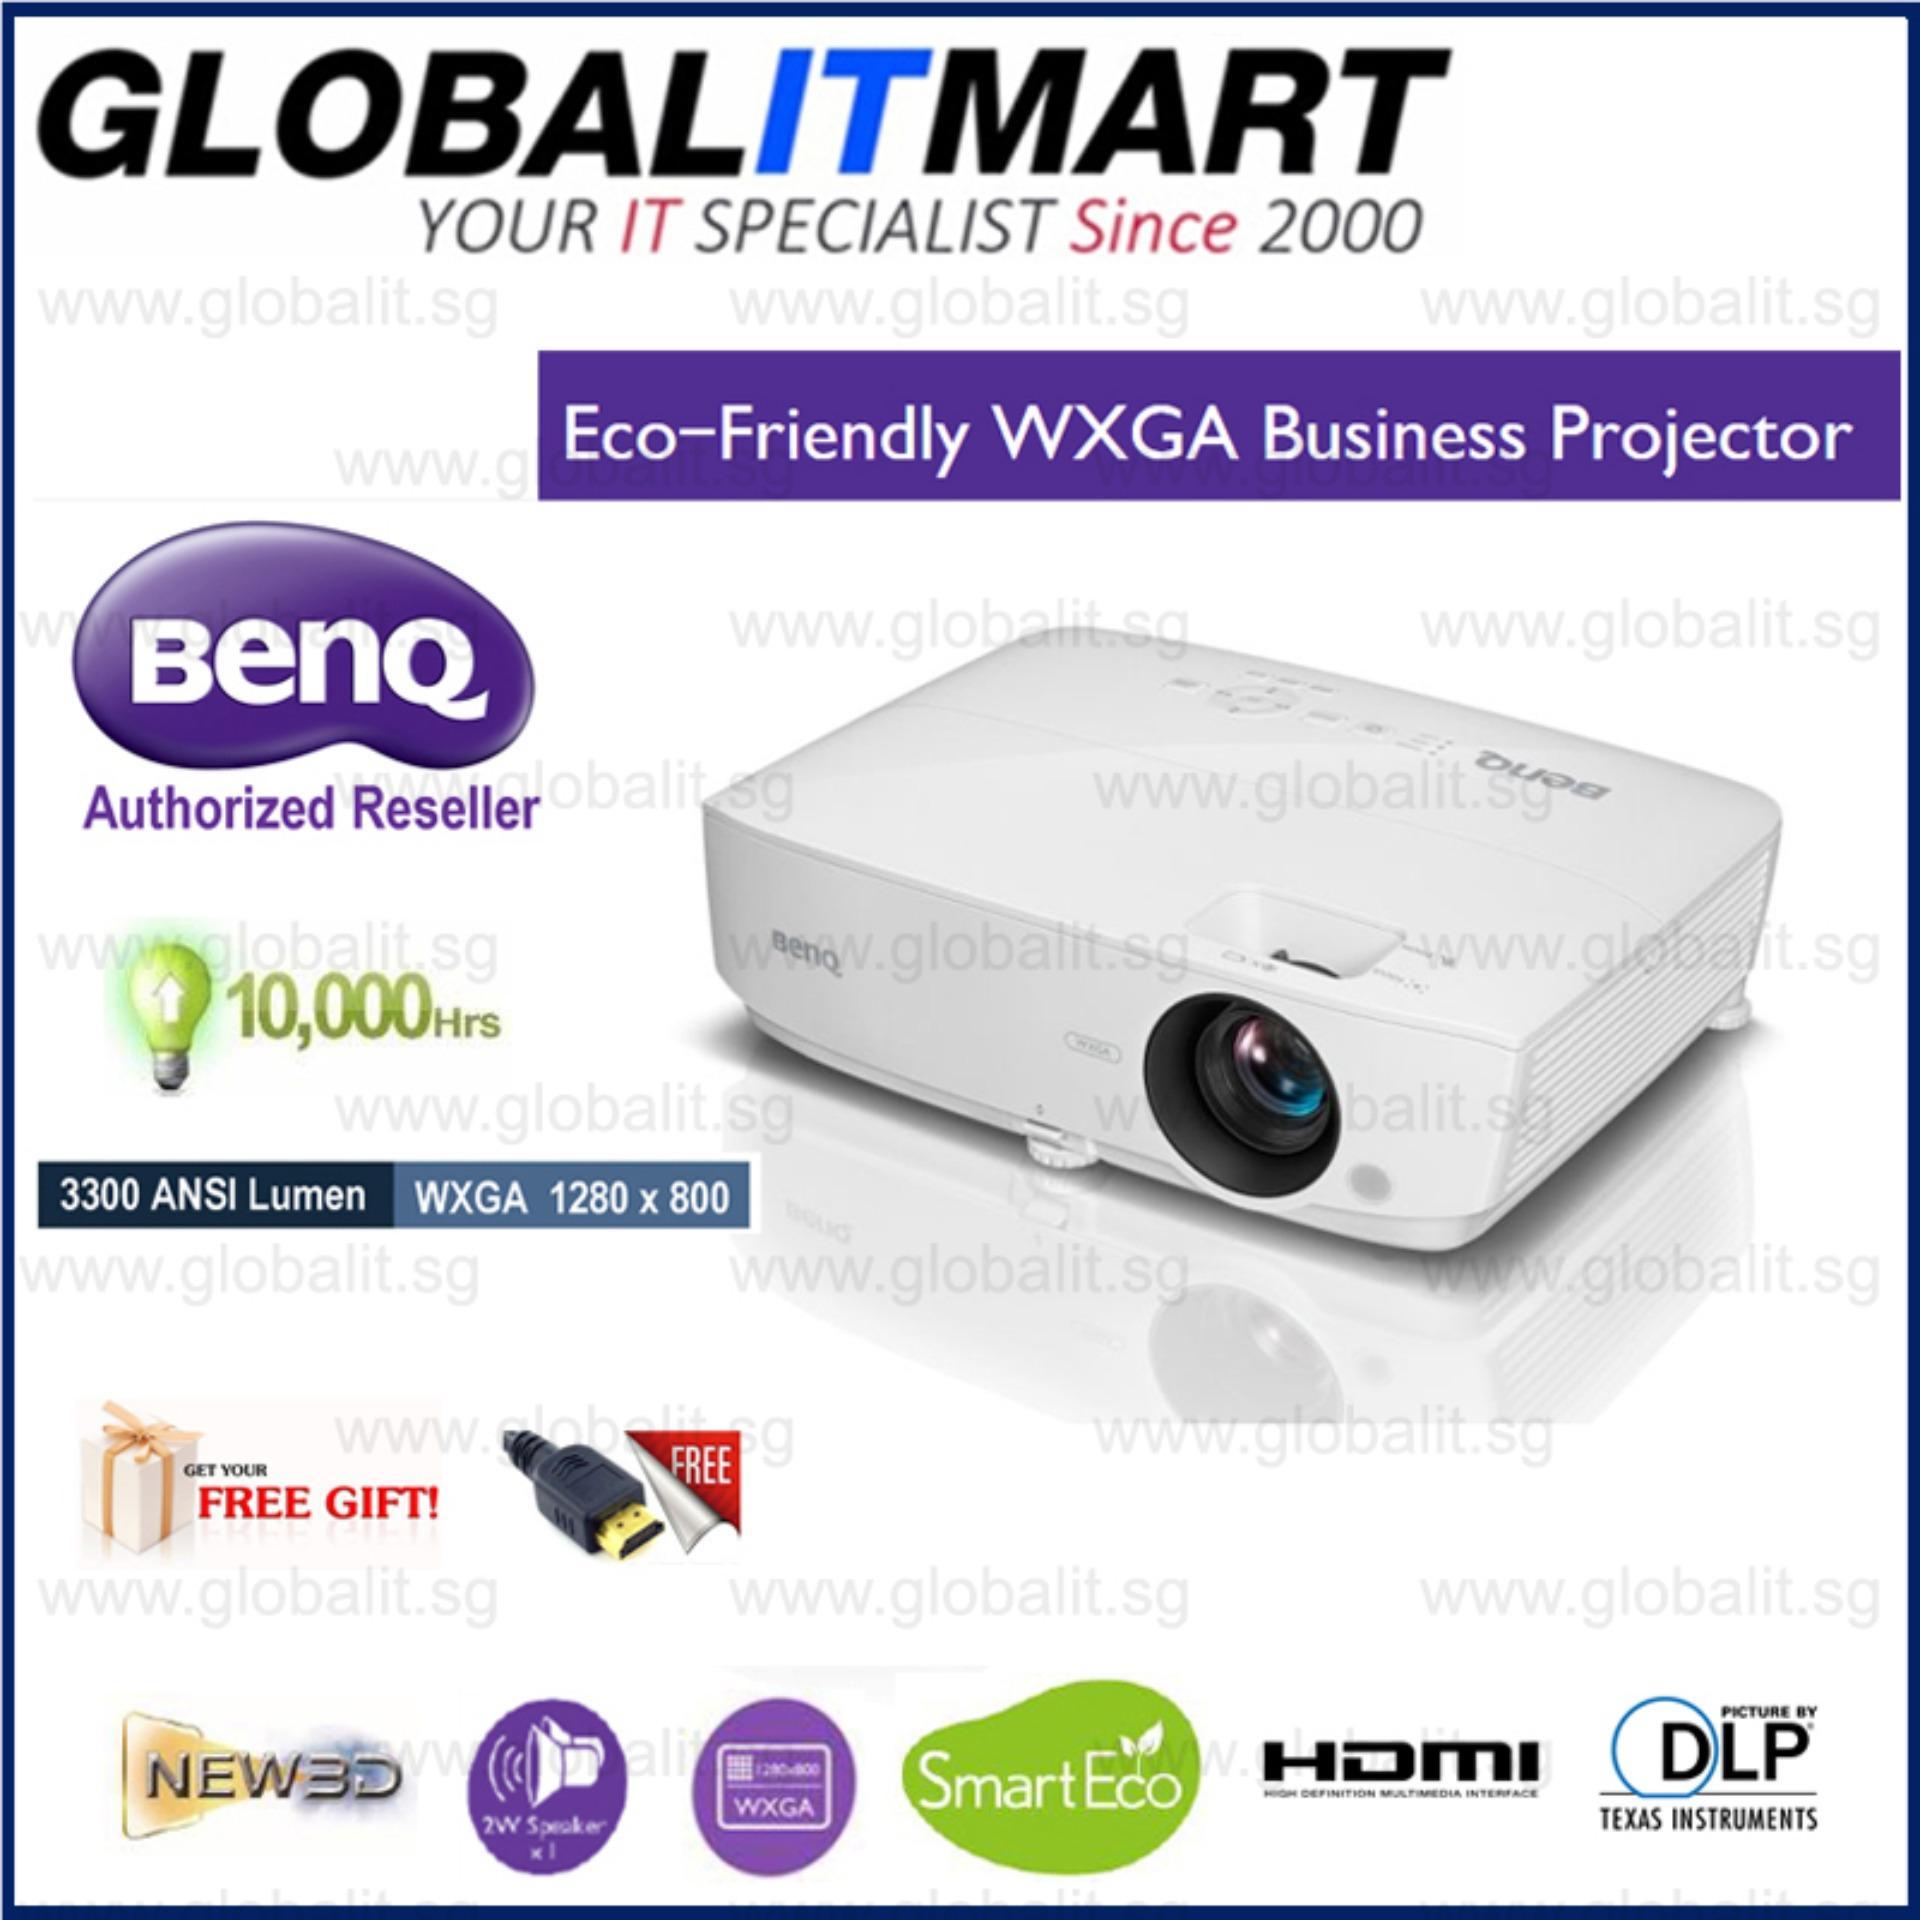 Benq Mw533 Dlp Wxga 1280X800 3300 Ansi Lumens Business Projector Sale